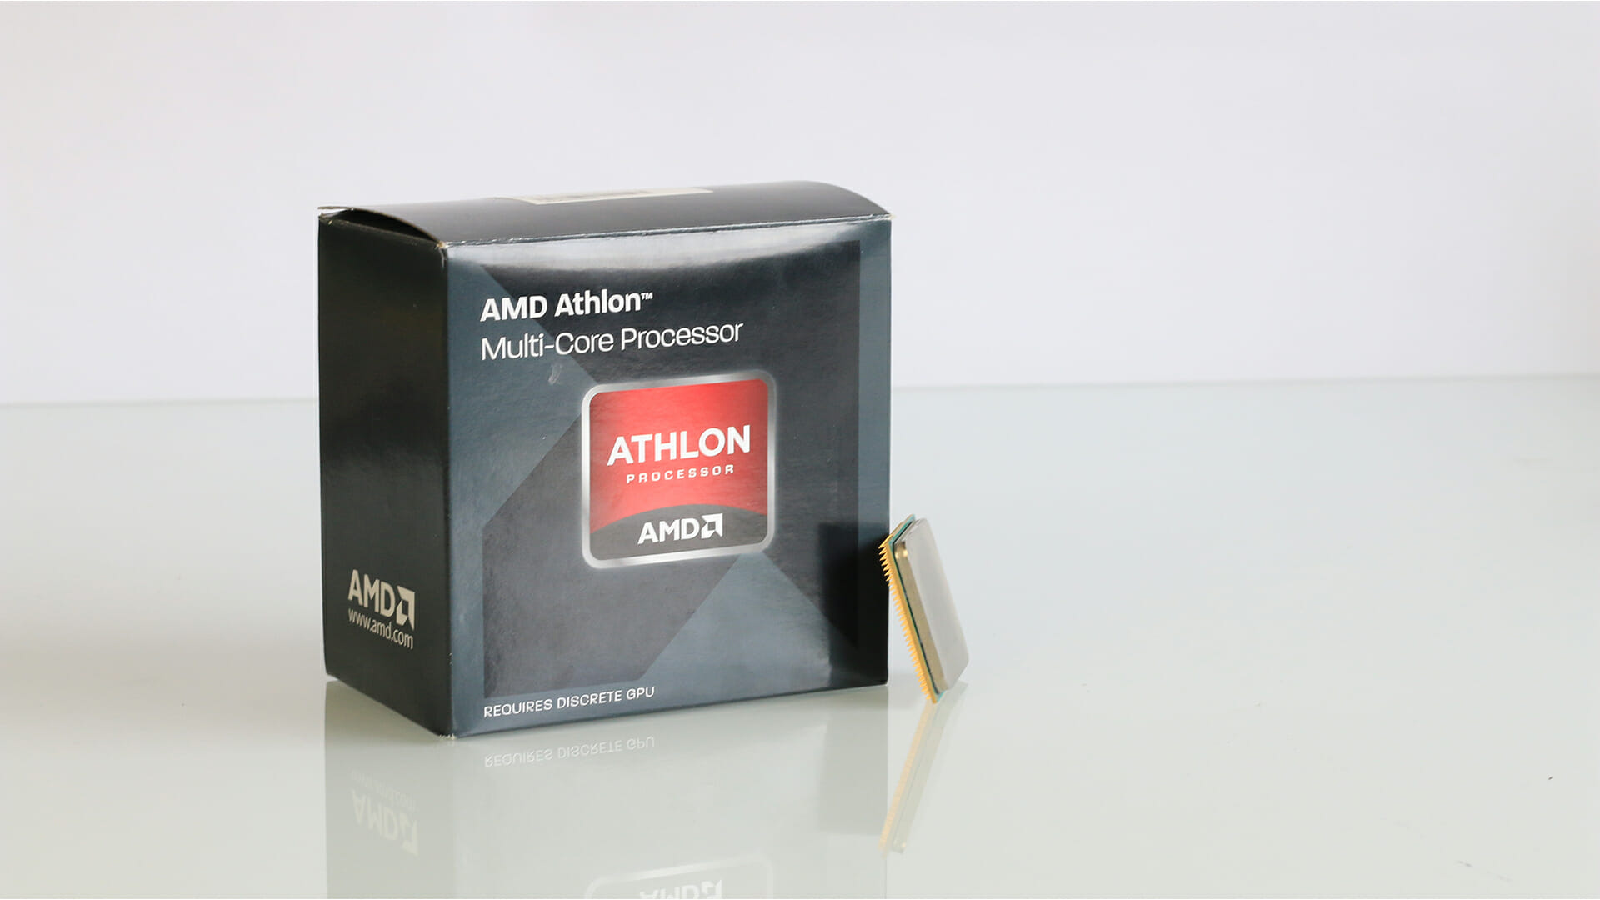 AMD Athlon X4-845 Quad-Core Processor Review 3